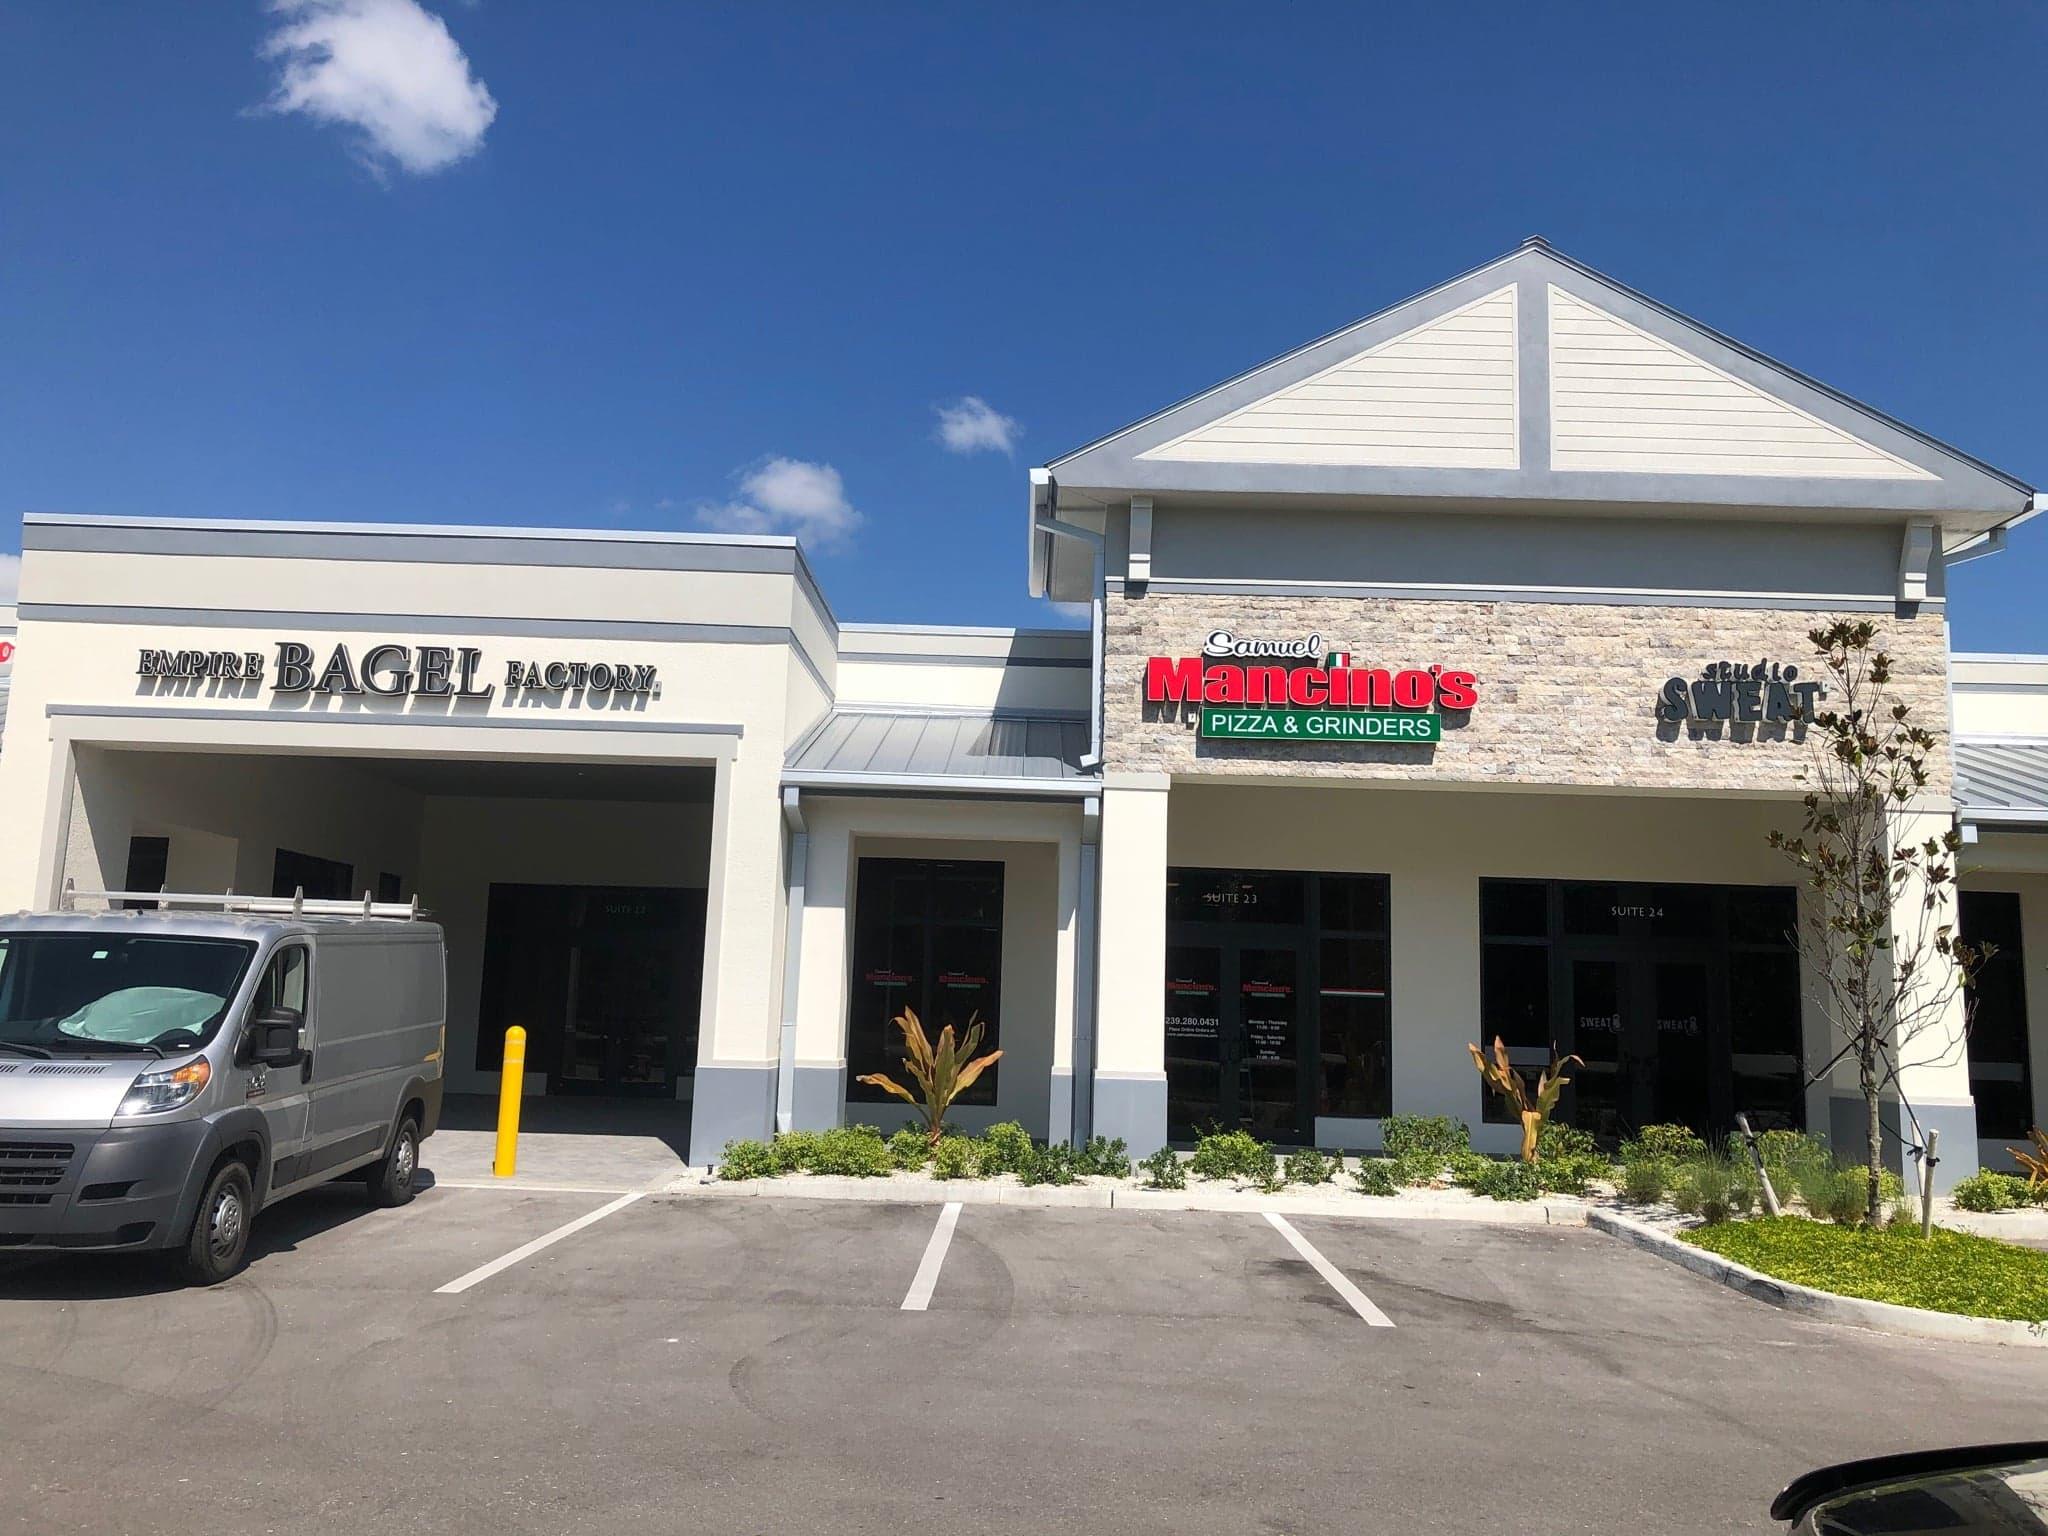 Florida Locations – Samuel Mancino's Italian Eatery